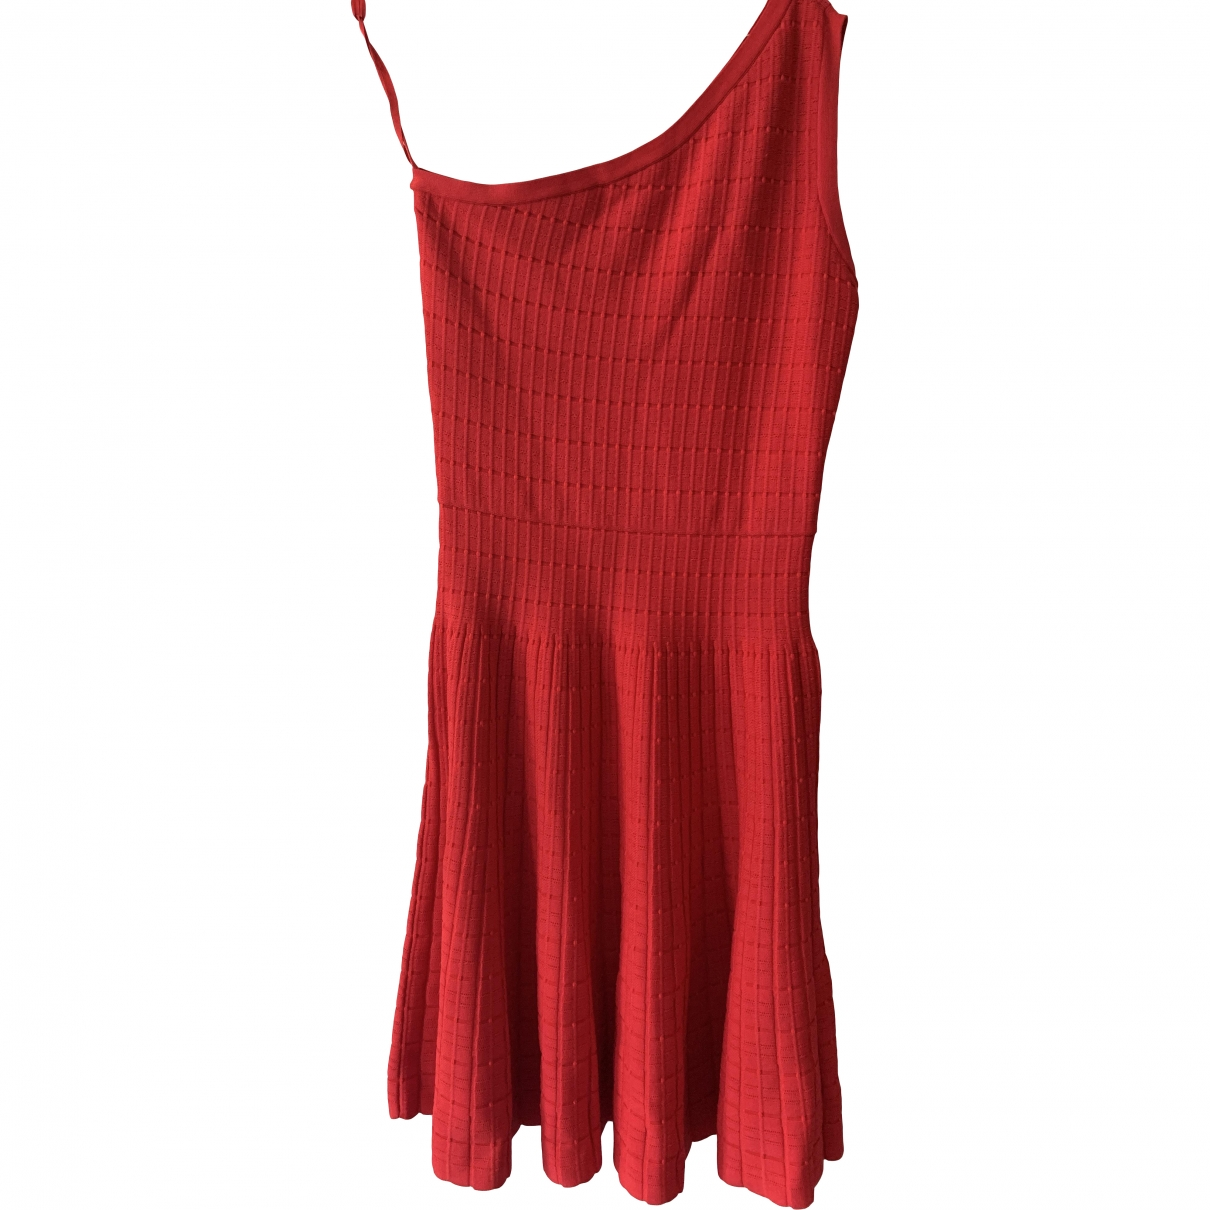 Michael Kors \N Red dress for Women 40 IT